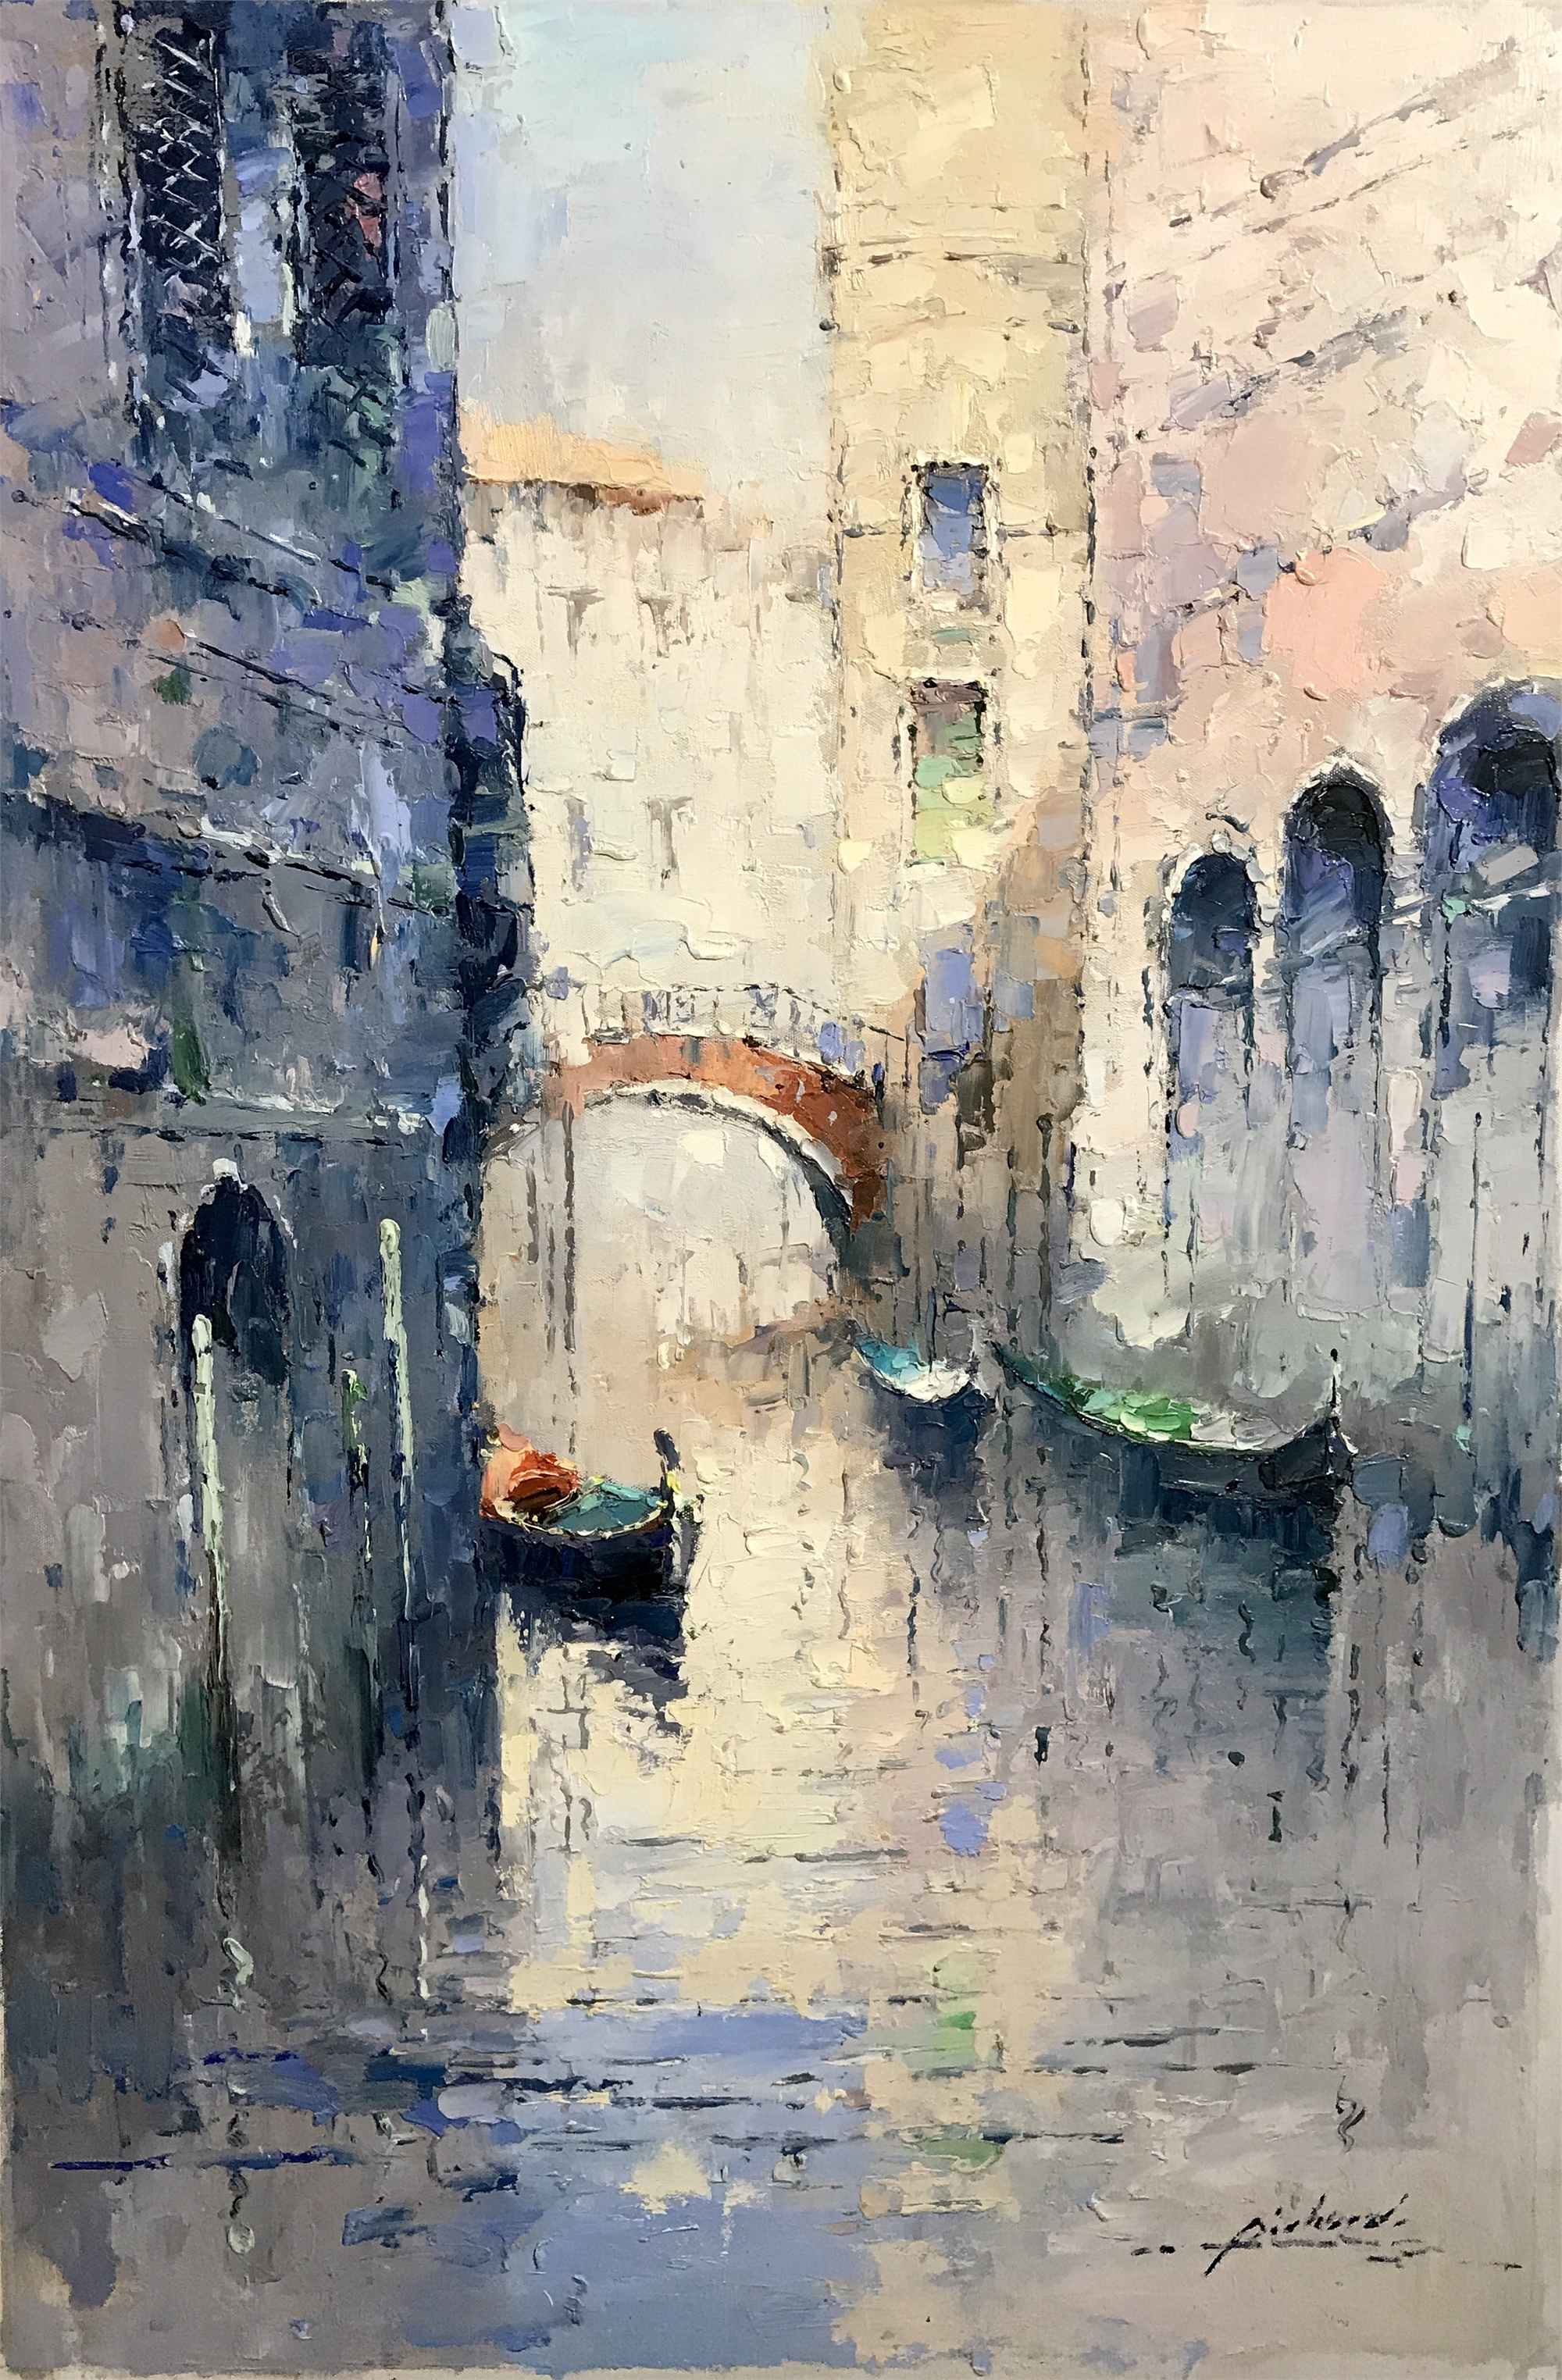 VENICE BRIDGE IN BLUE by PICHARD